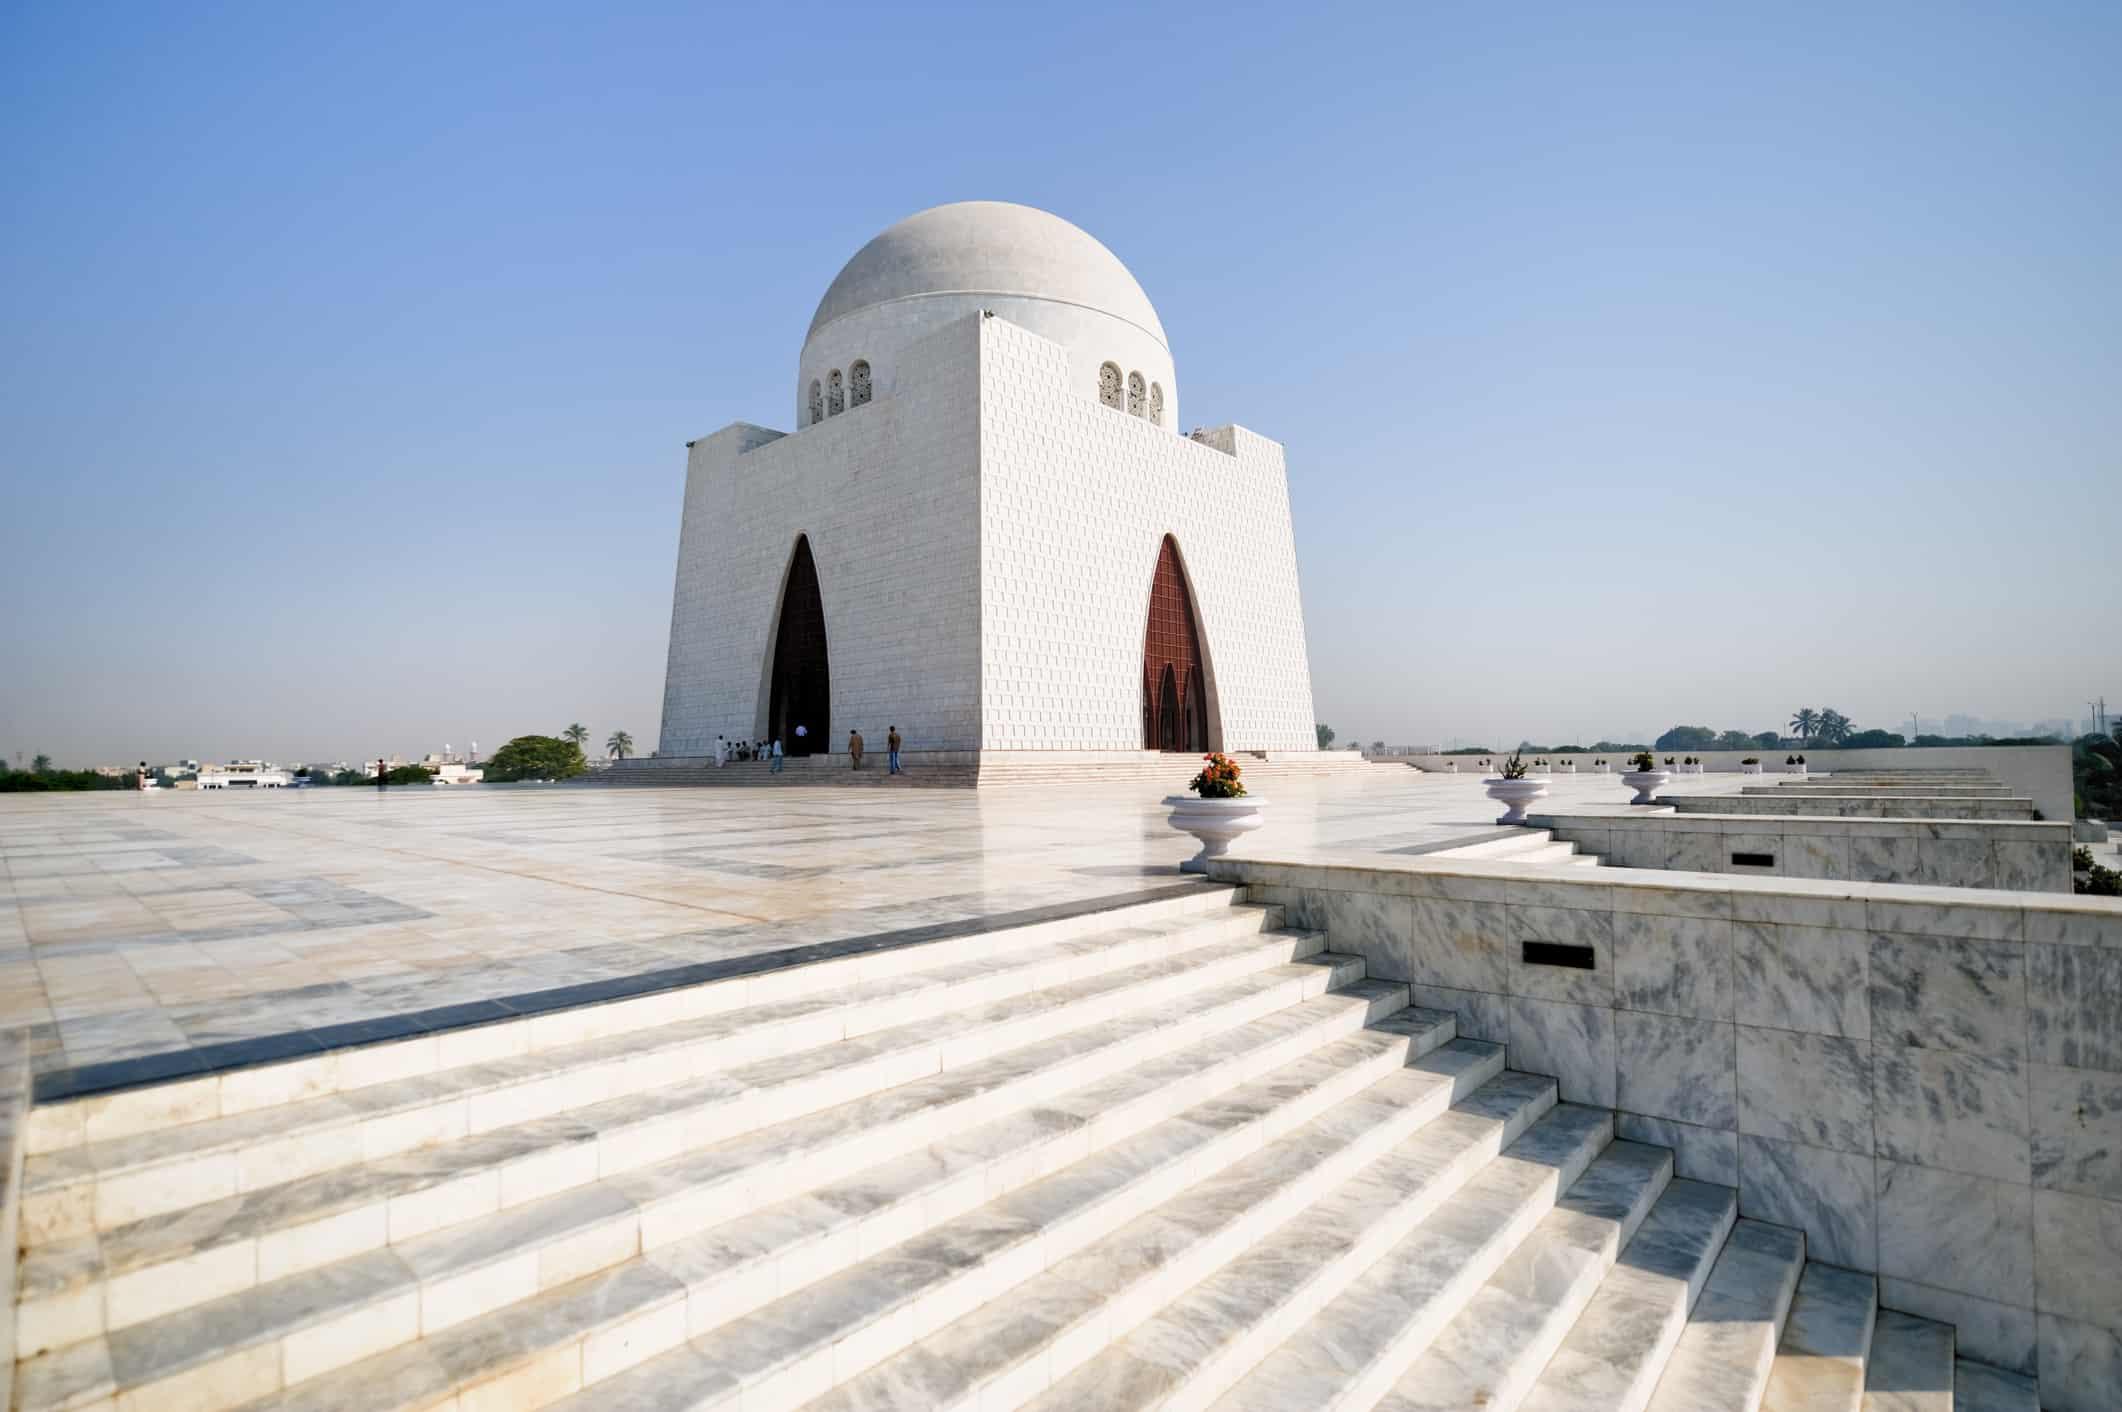 Jinnah Mausoleum Pakistan